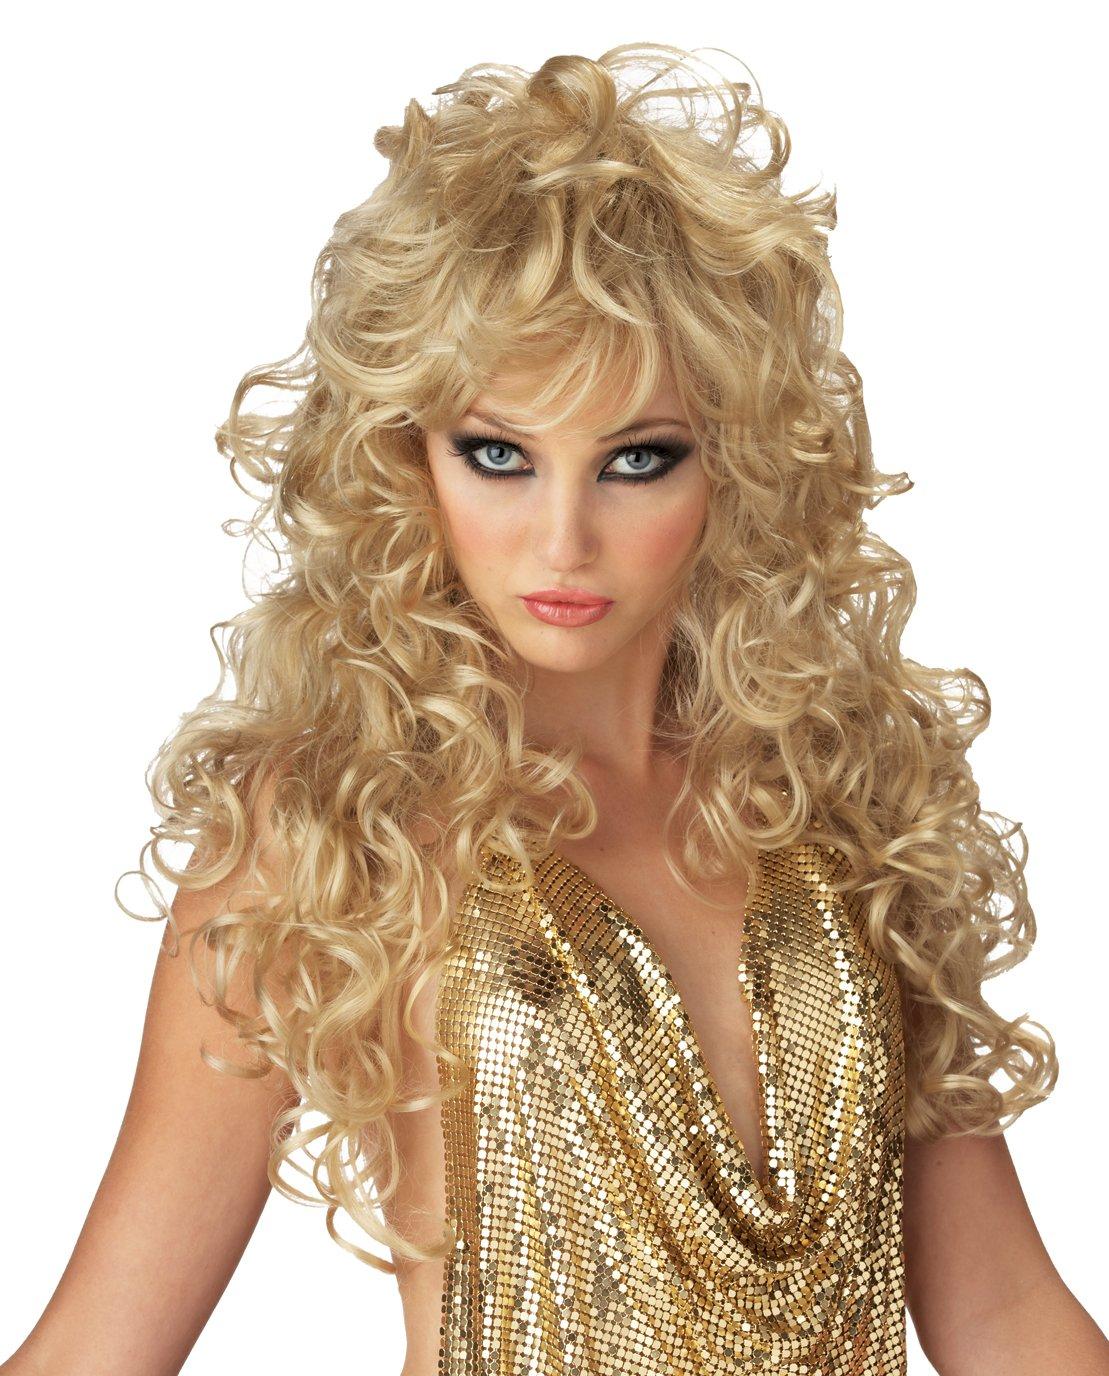 Sexy Seduction Girls Gone Wild Adult Costume Wig #70426